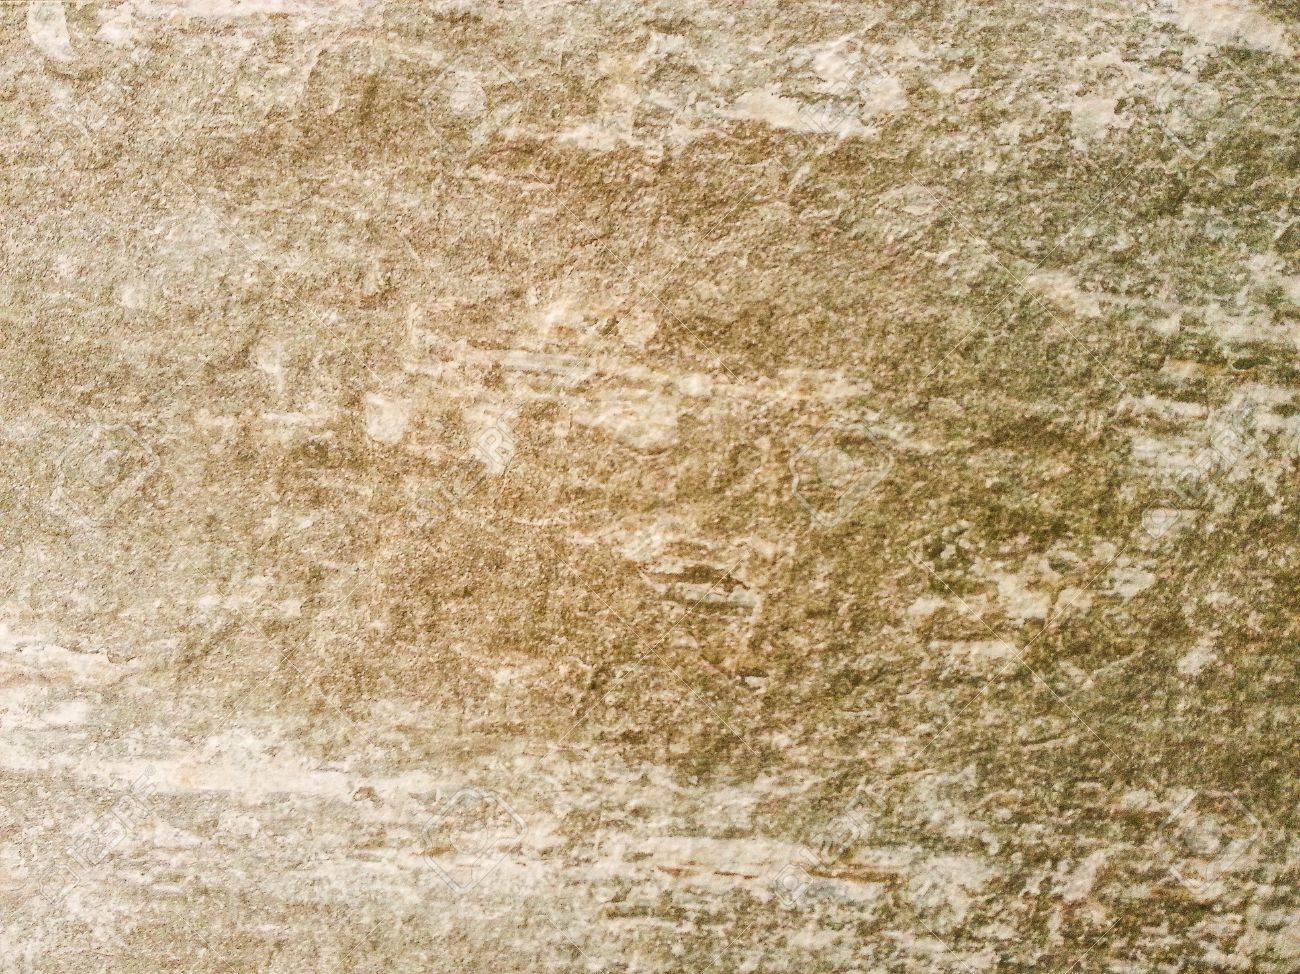 Striped yellow rock cracks Stock Photo - 21848872